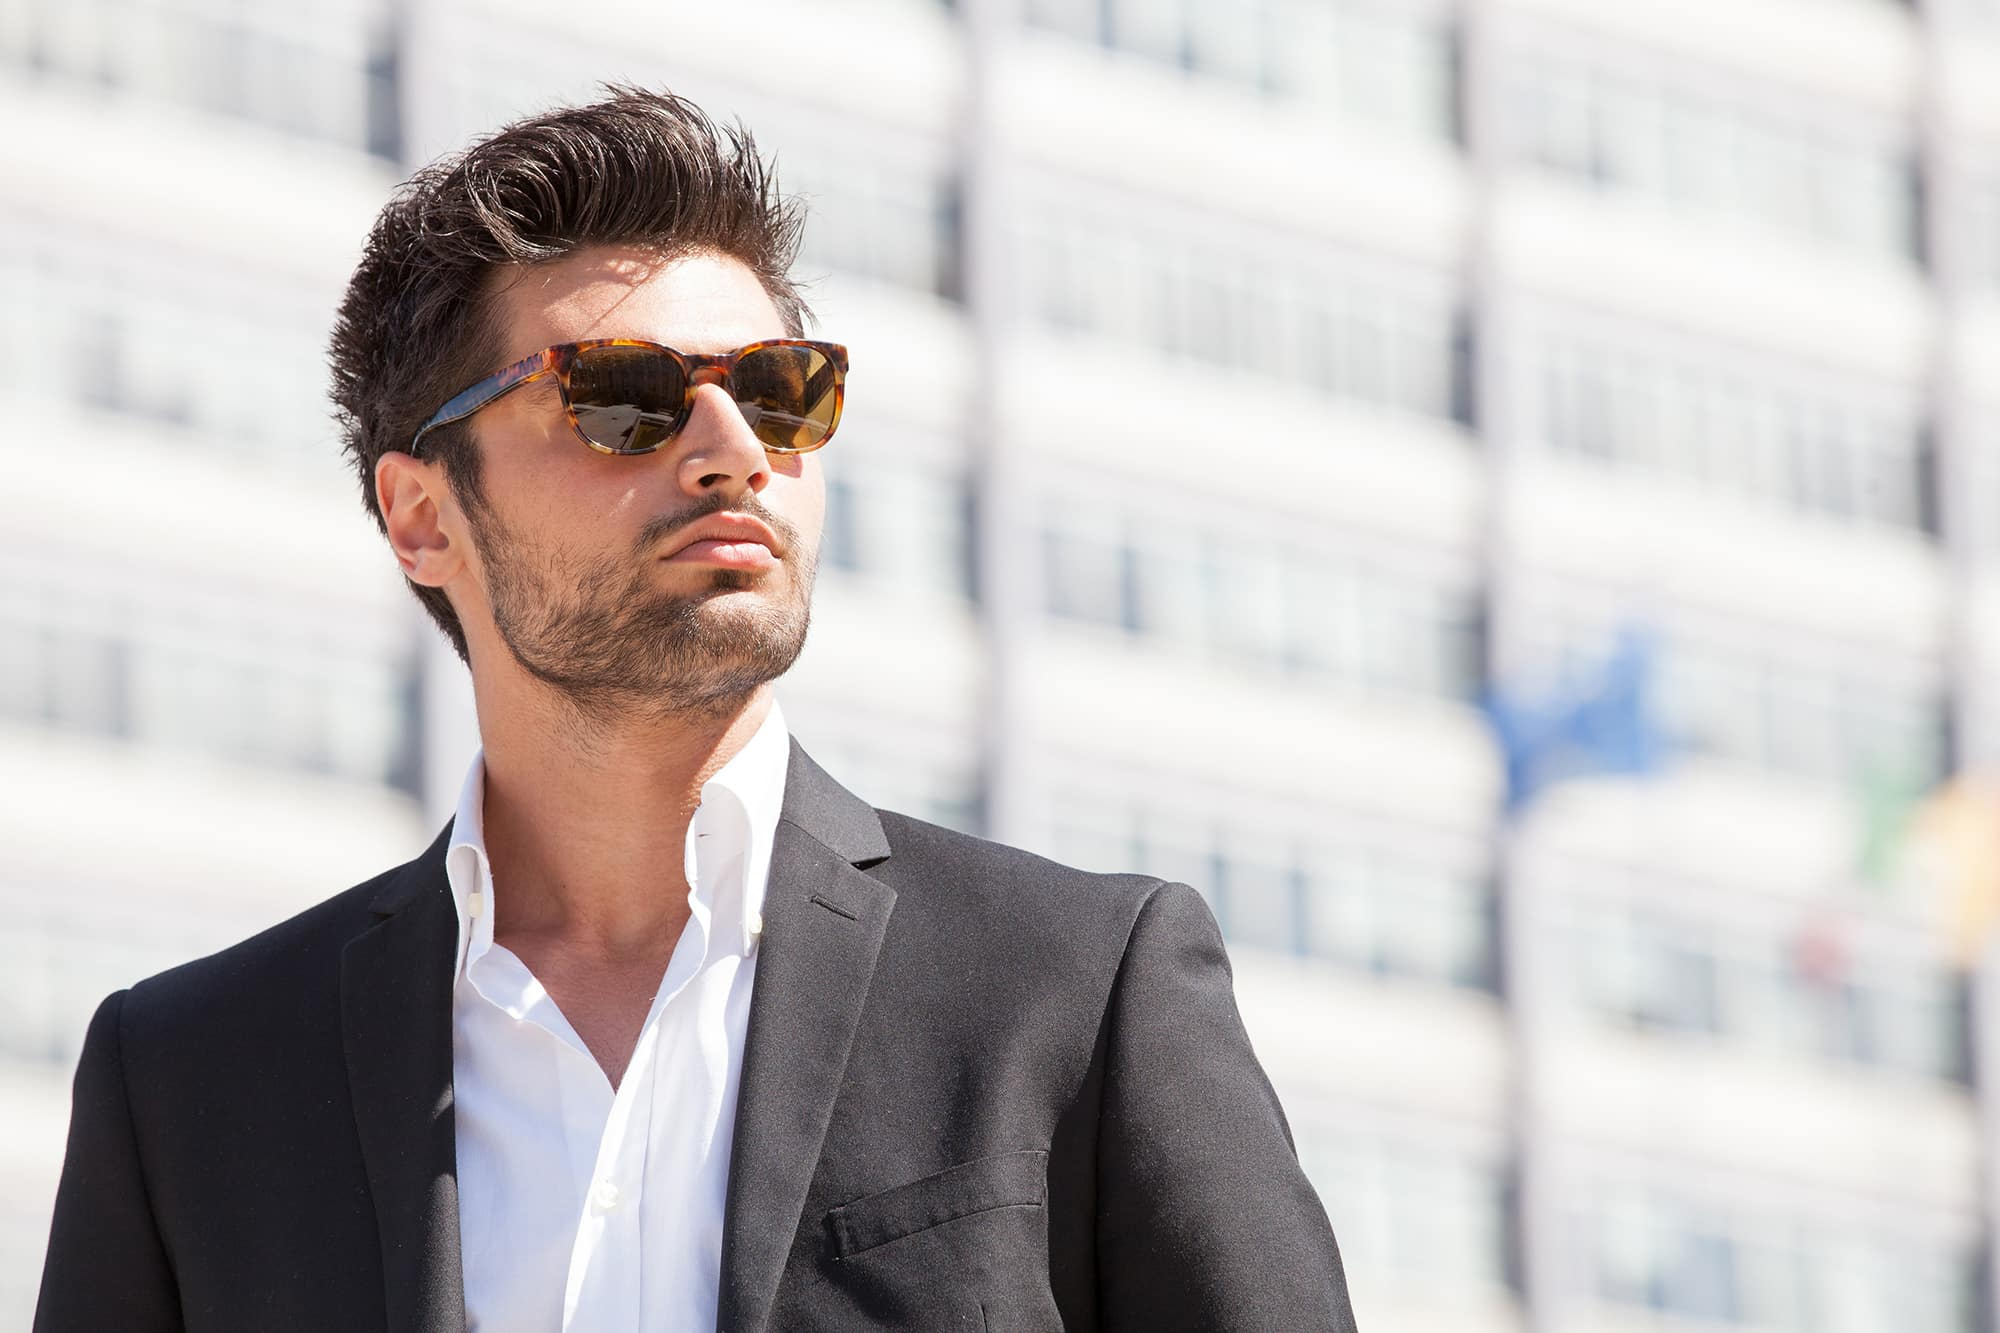 Waterloo Sunglasses